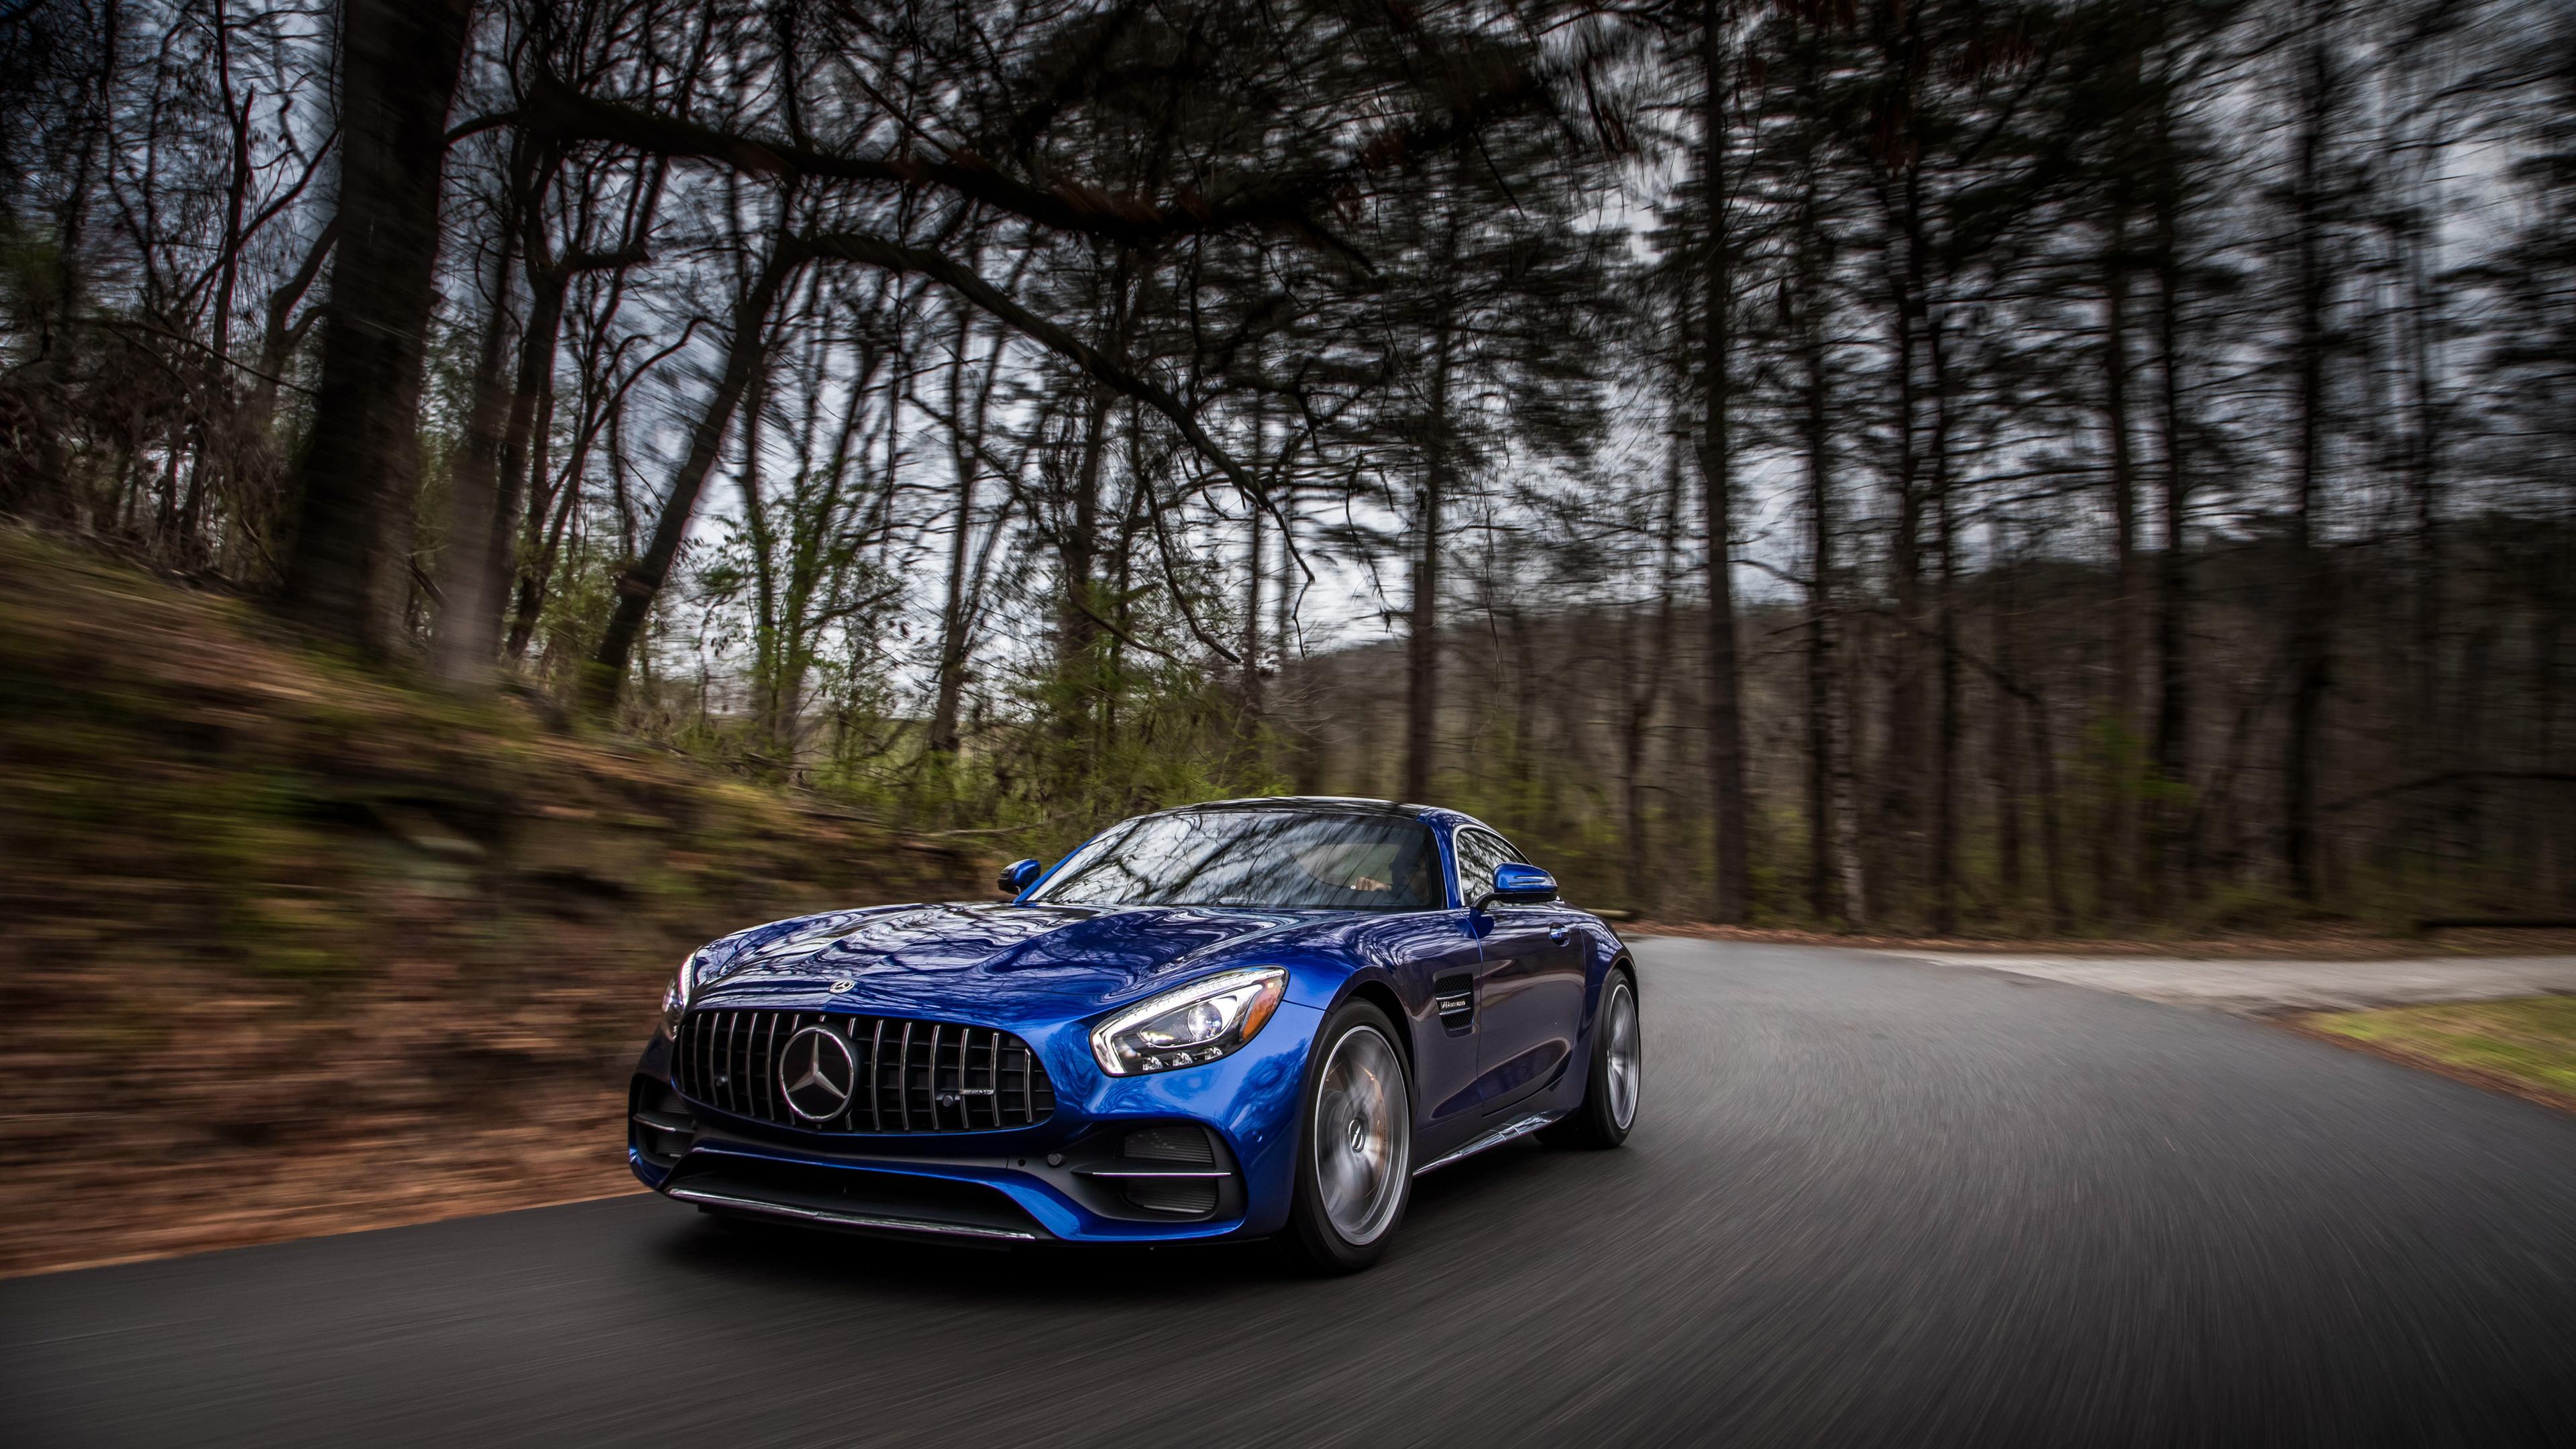 2018 mercedes amg gt c 1539110659 - 2018 Mercedes AMG GT C - mercedes wallpapers, mercedes amg gtc wallpapers, hd-wallpapers, cars wallpapers, 4k-wallpapers, 2018 cars wallpapers